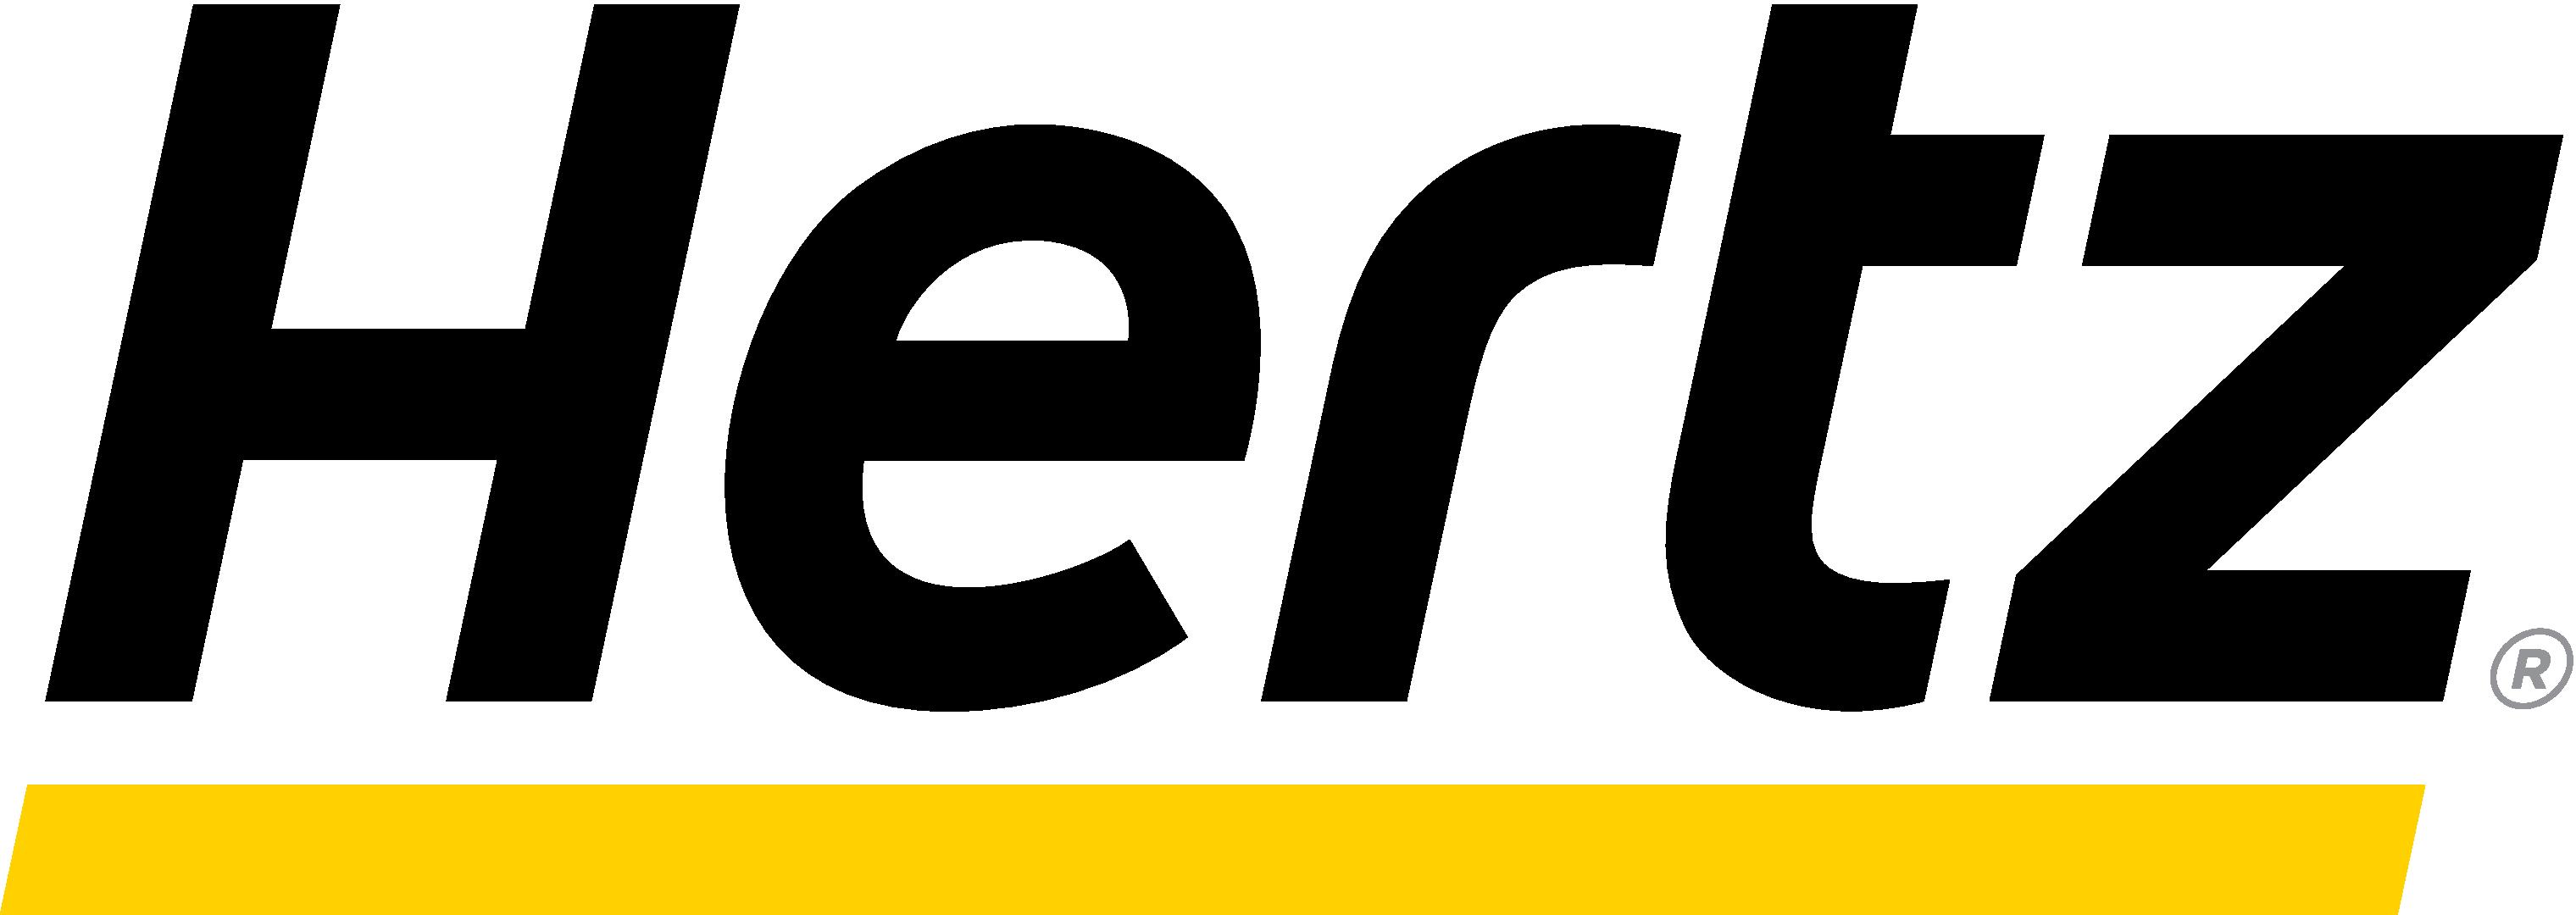 alt='The Hertz Corporation'  Title='The Hertz Corporation'